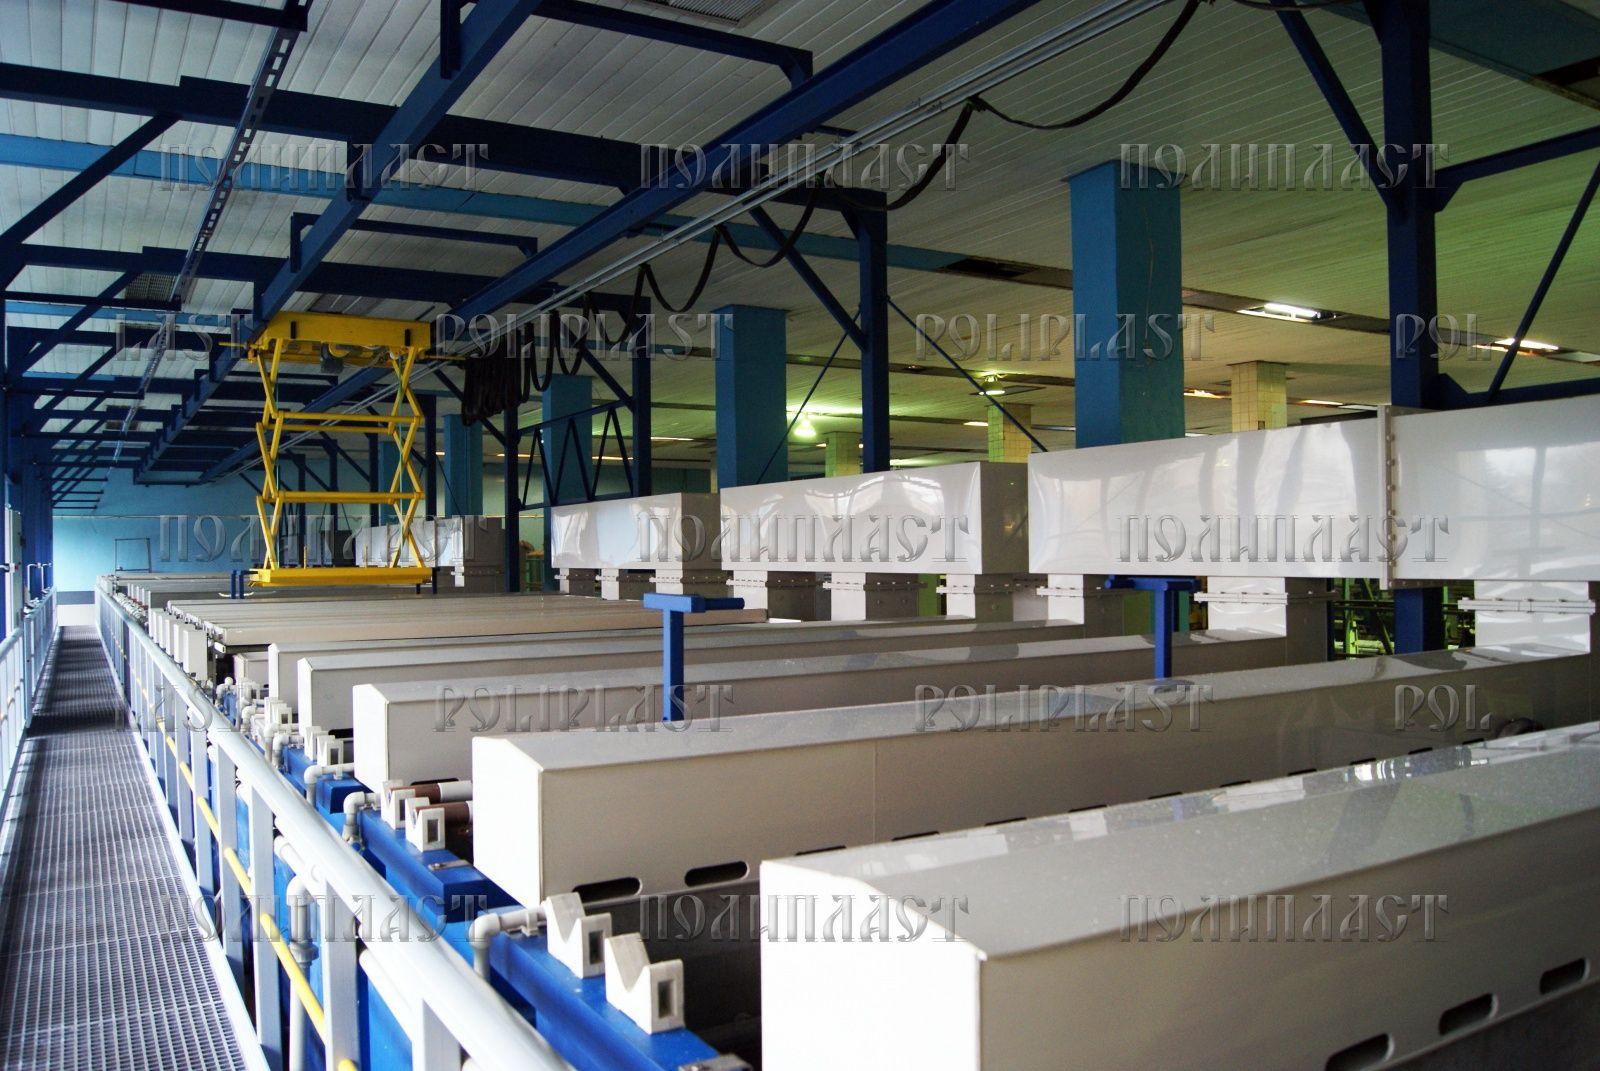 Gallery of electroplating equipment - Poliplast Ltd